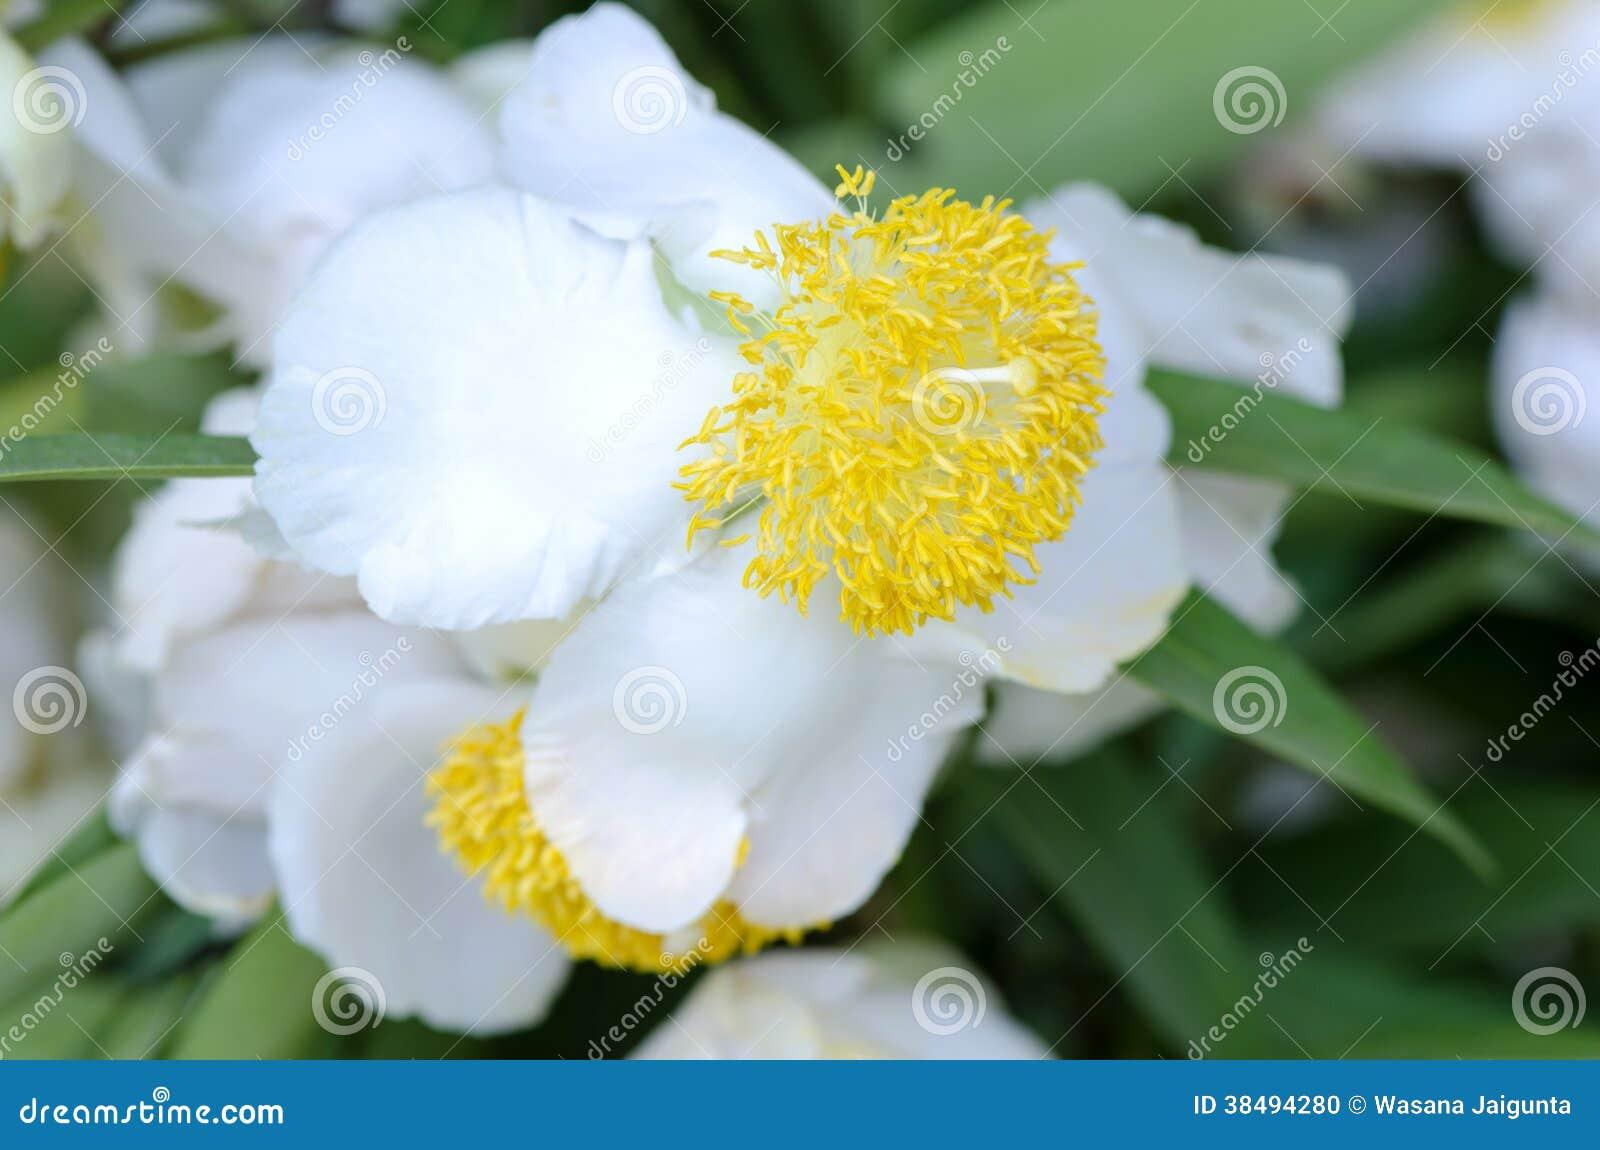 indian rose chestnut mesua ferrea linn stock photo